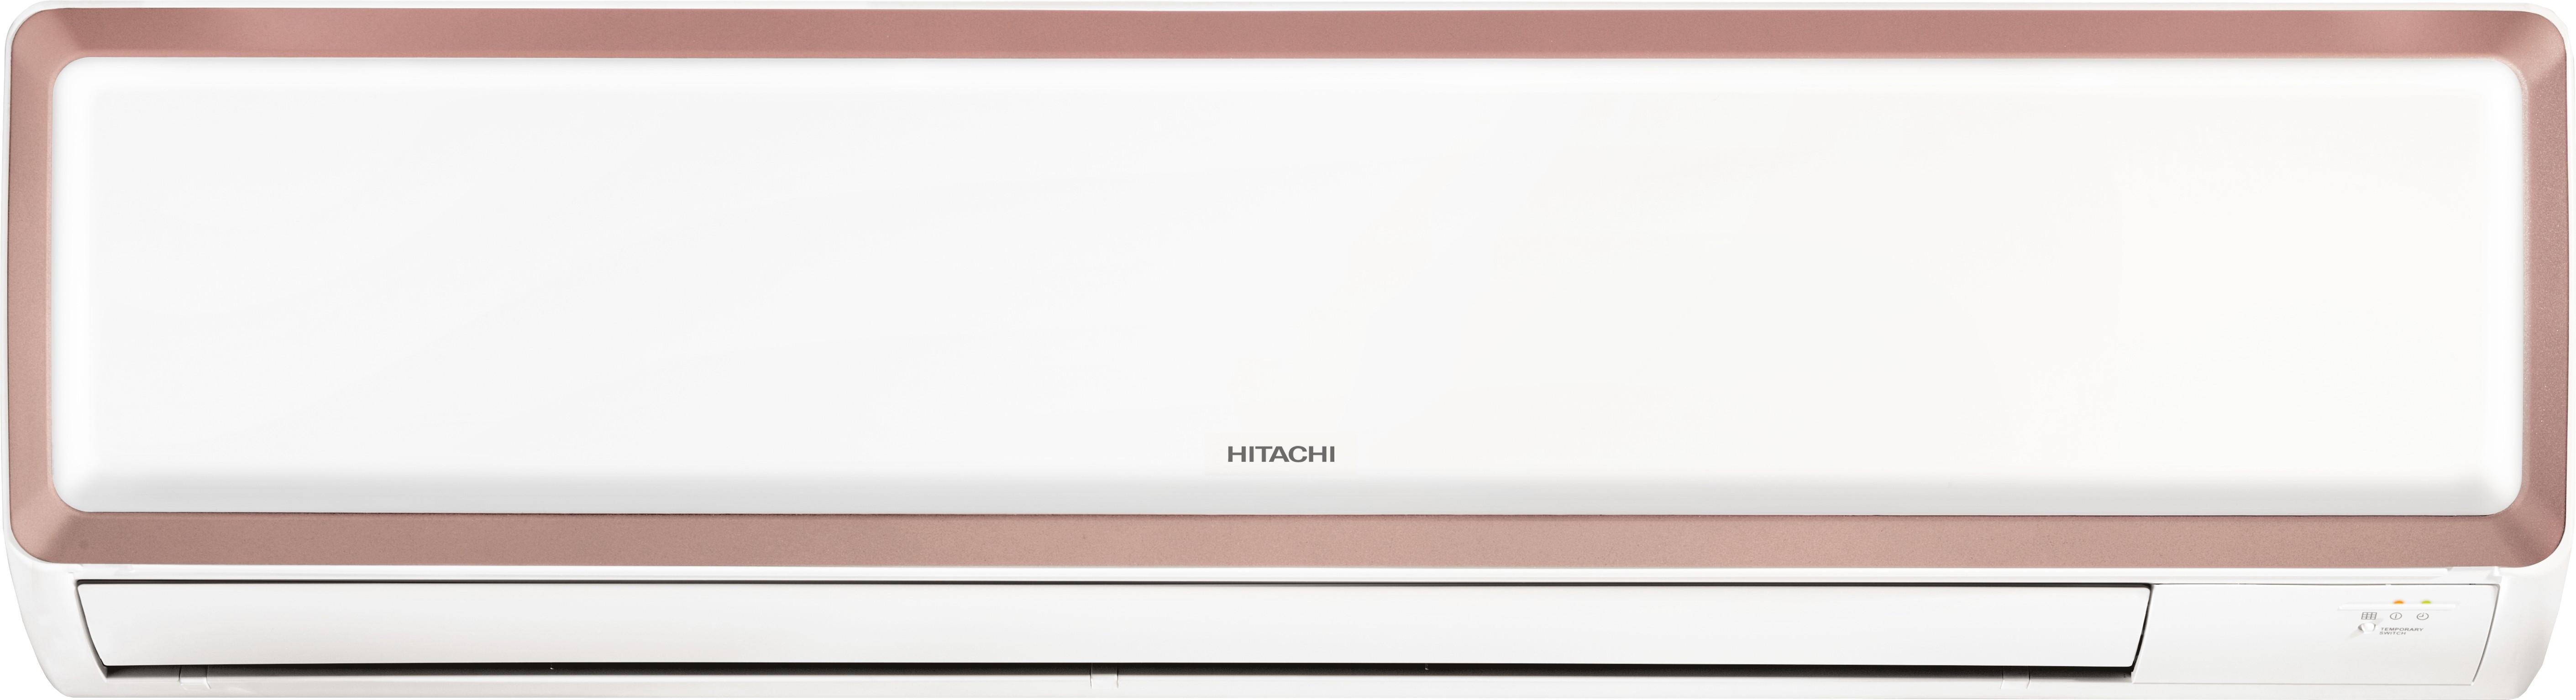 Hitachi 1 Tons Inverter Split AC Copper (Hitachi)  Buy Online